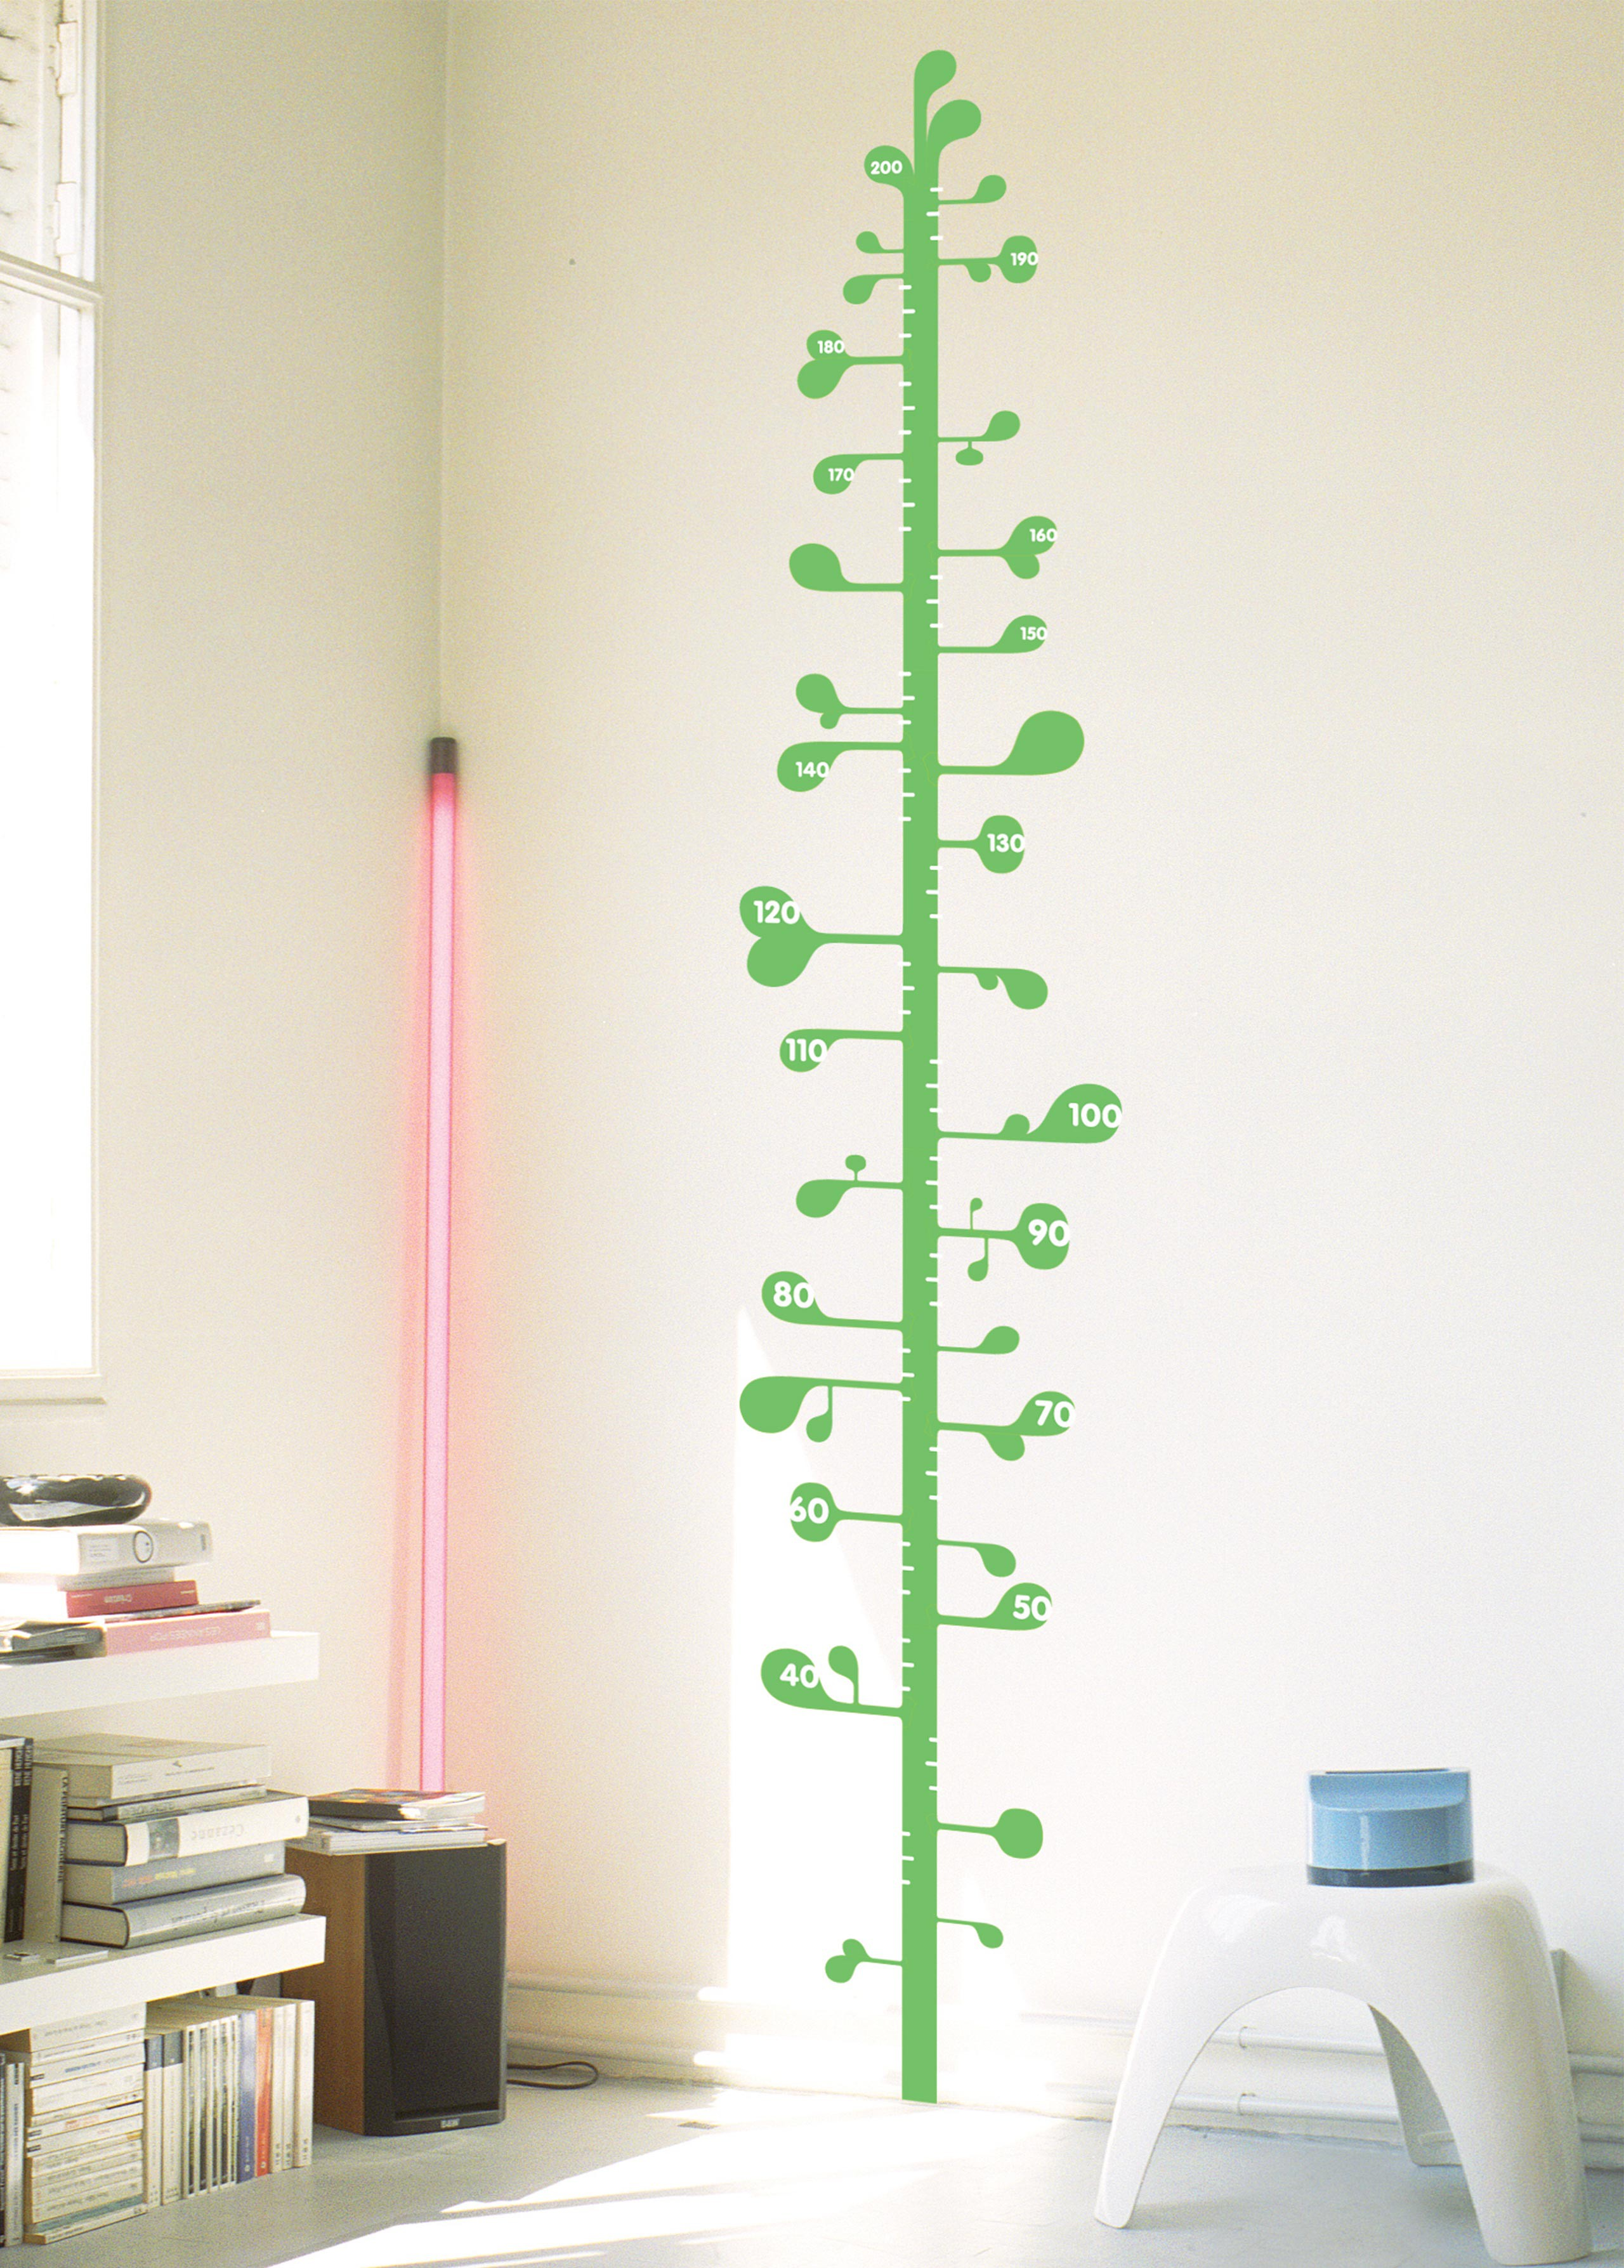 Measuring plant